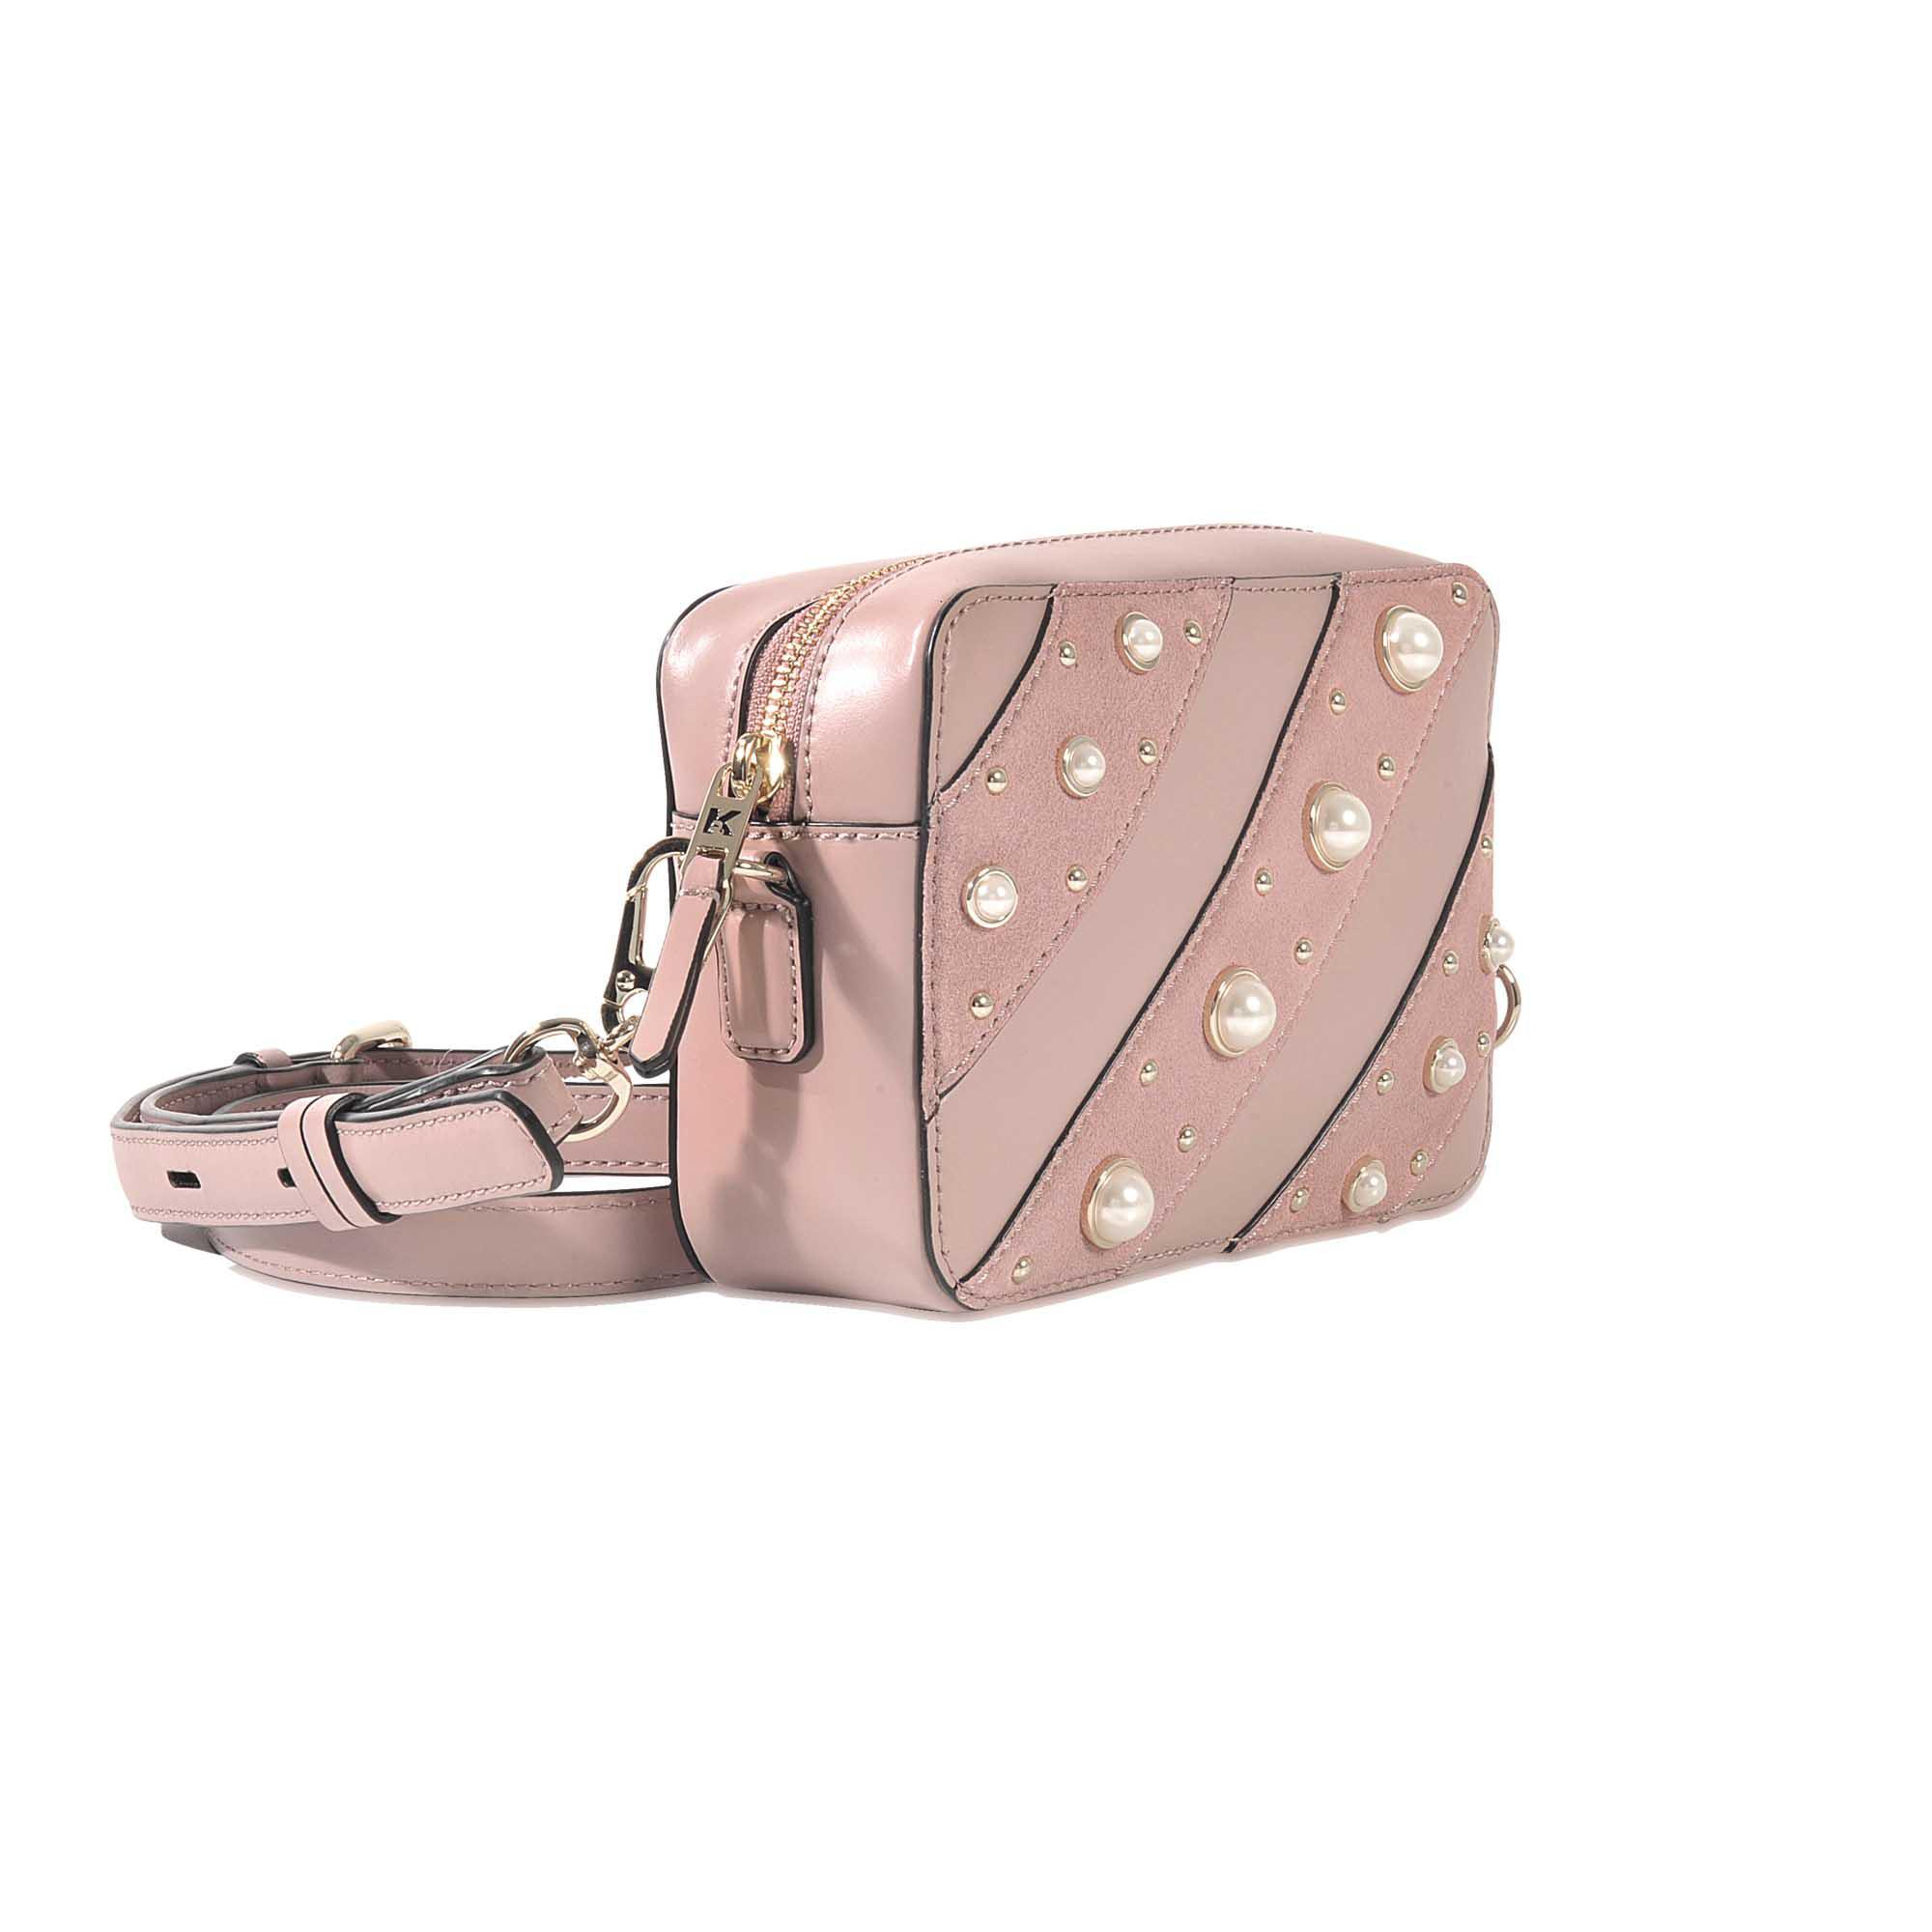 c4afc768d7e Lyst - Karl Lagerfeld K ikonik Pearls Camera Bag in Pink